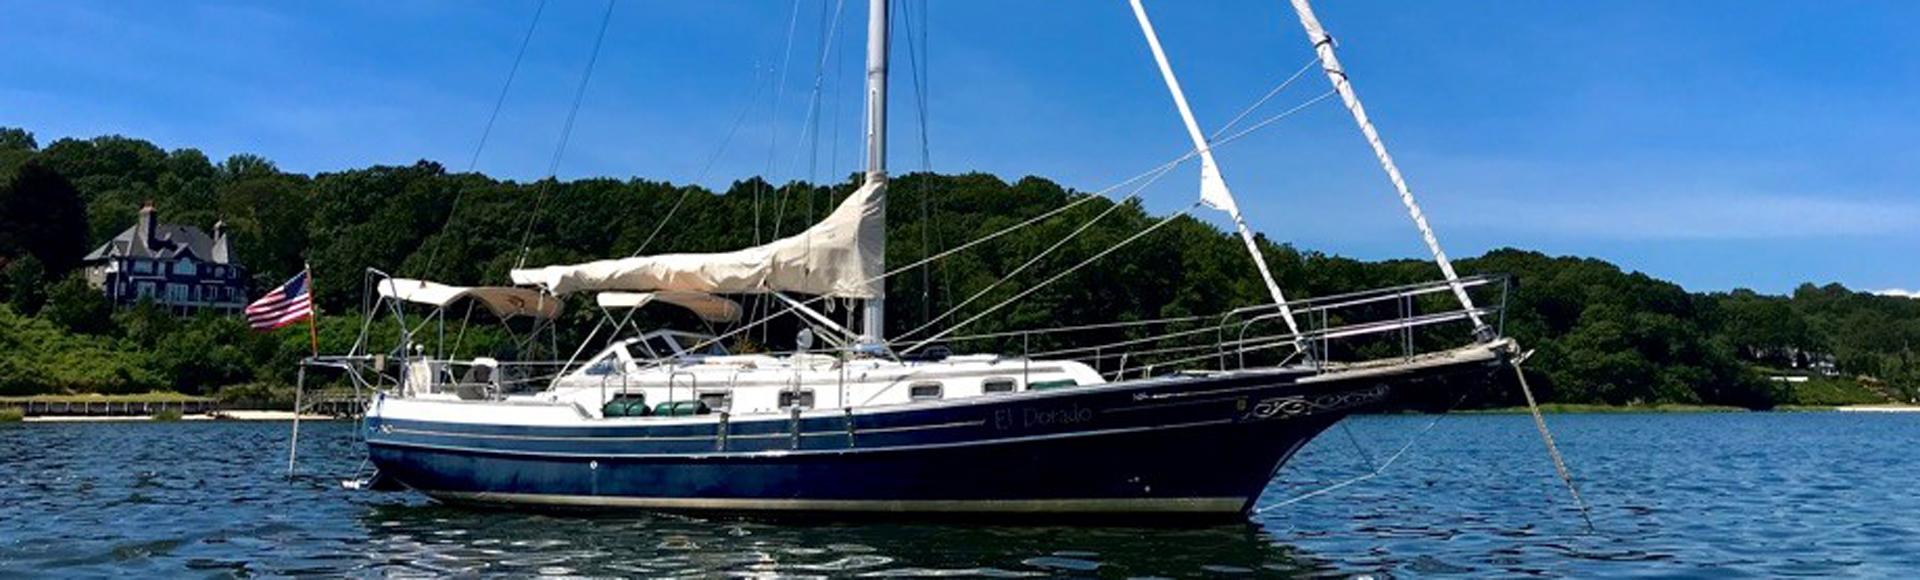 "SALE PENDING Fall 2020 1999 Gozzard 37A Hull #1 ""El Dorado"""